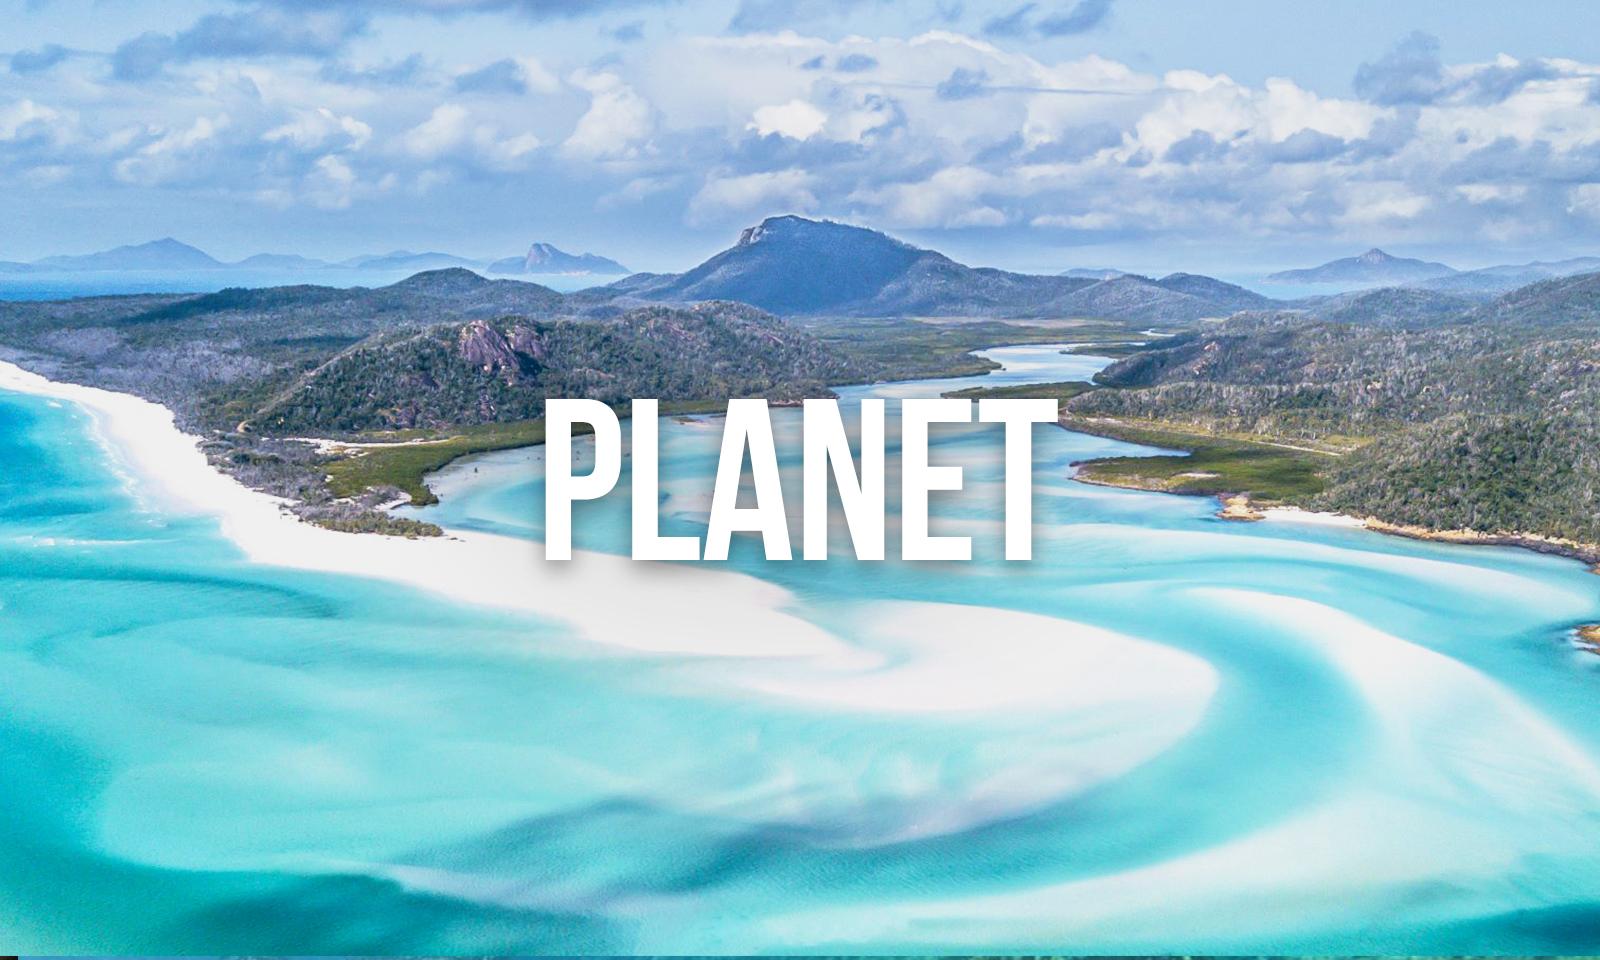 Responsilbe Travel Ultimate Adventure Travel Planet